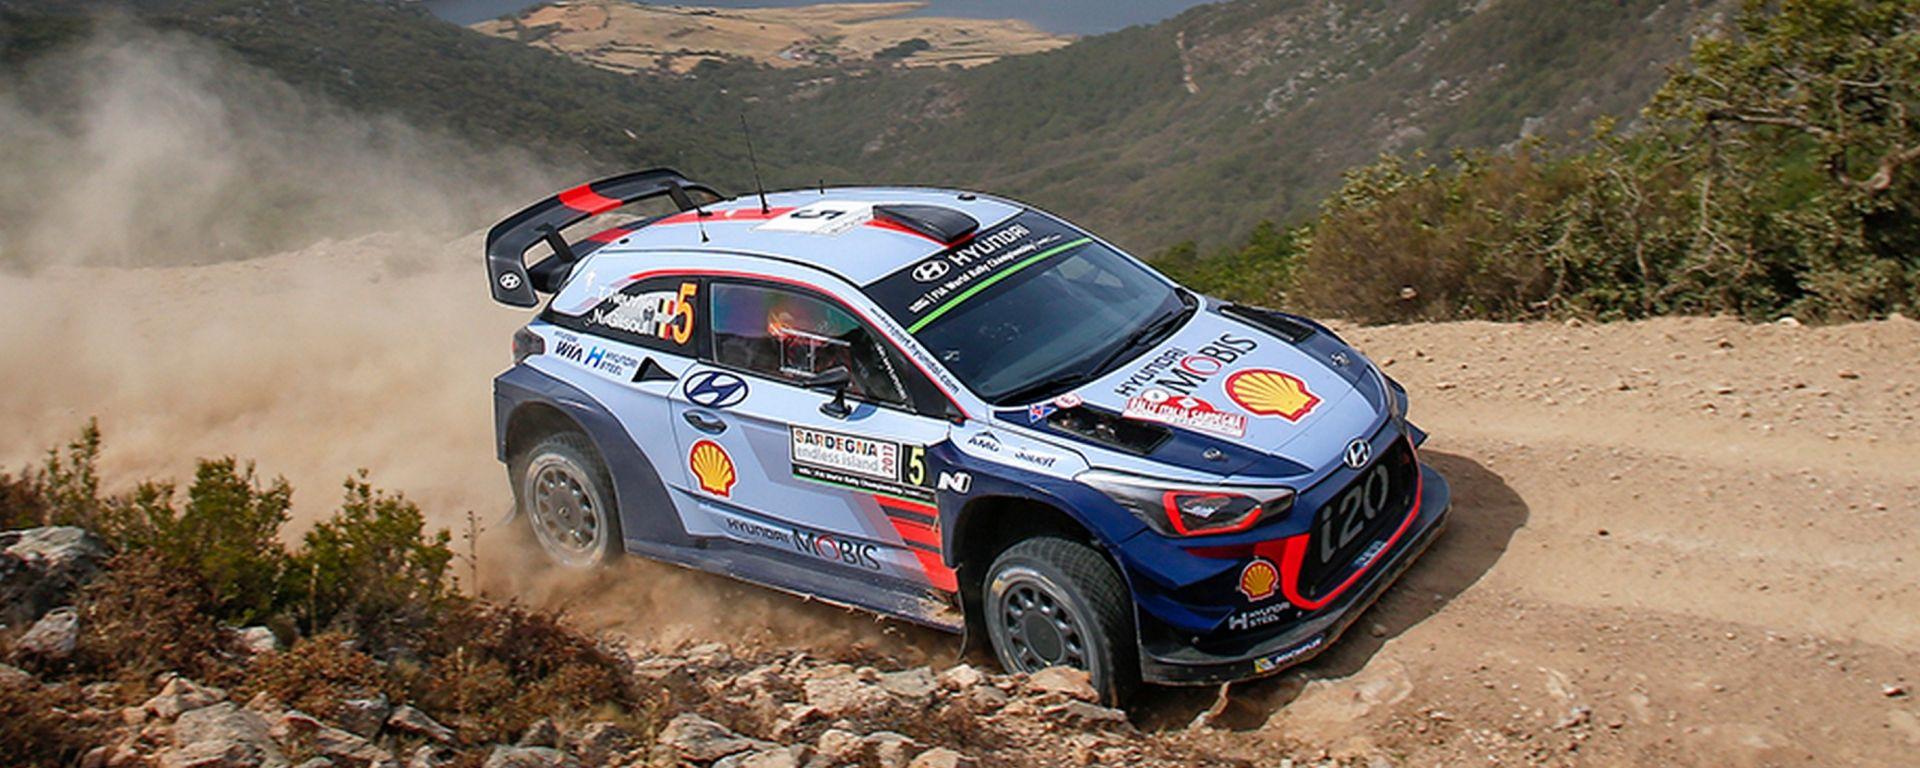 WRC Sardegna 2017: navigatori Hyundai i20 WRC per un giorno